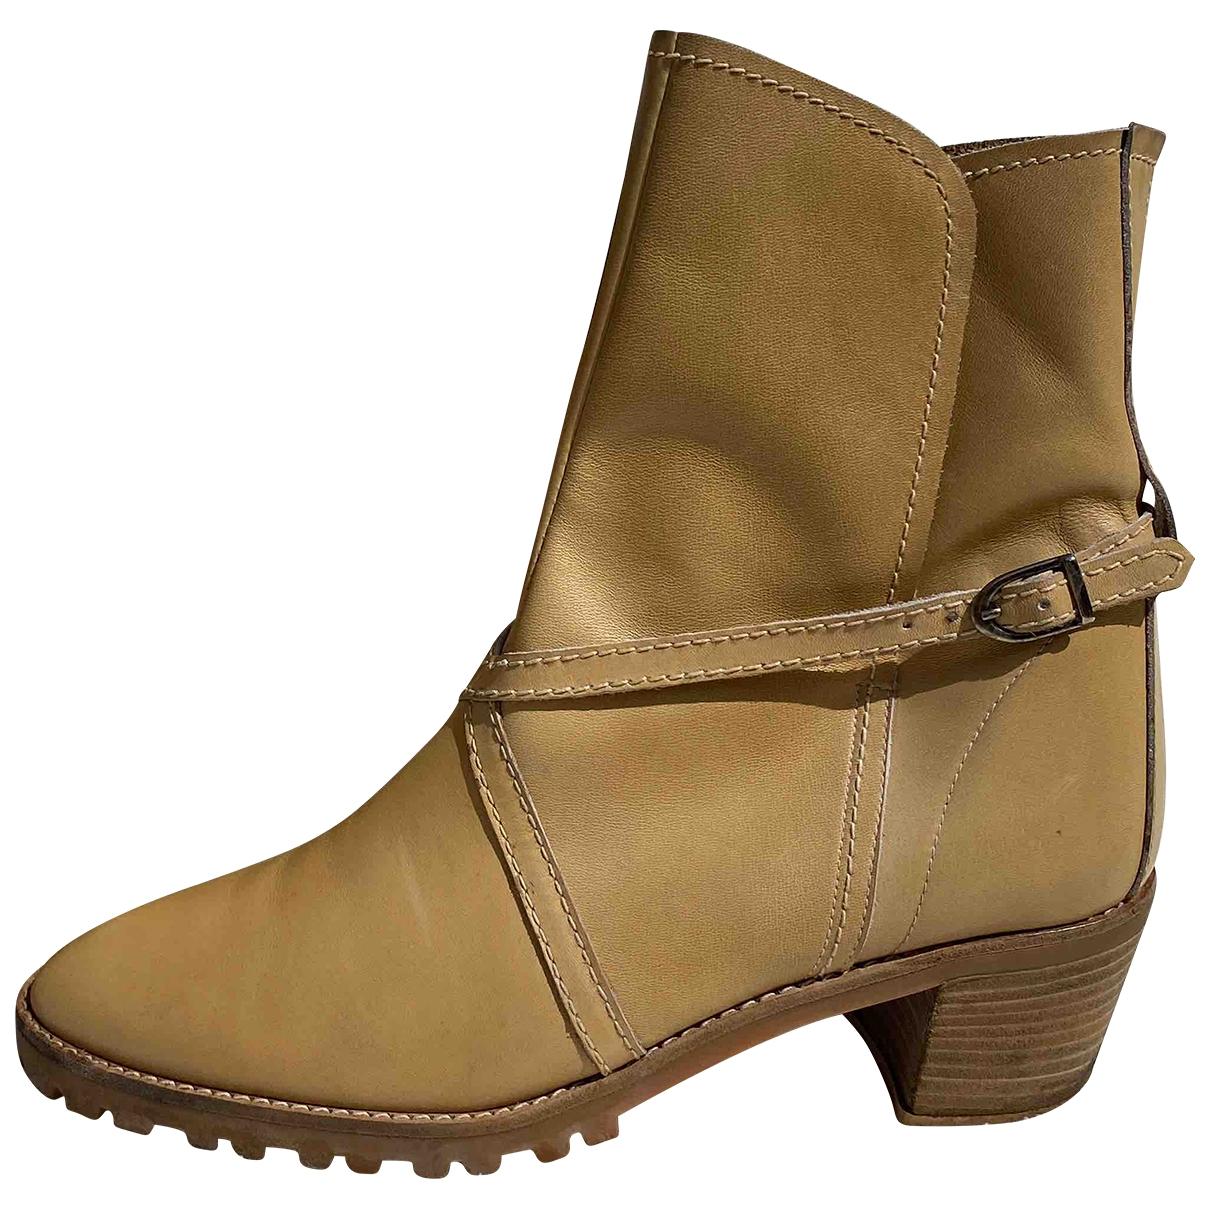 Geoffrey Beene - Boots   pour femme en cuir - camel